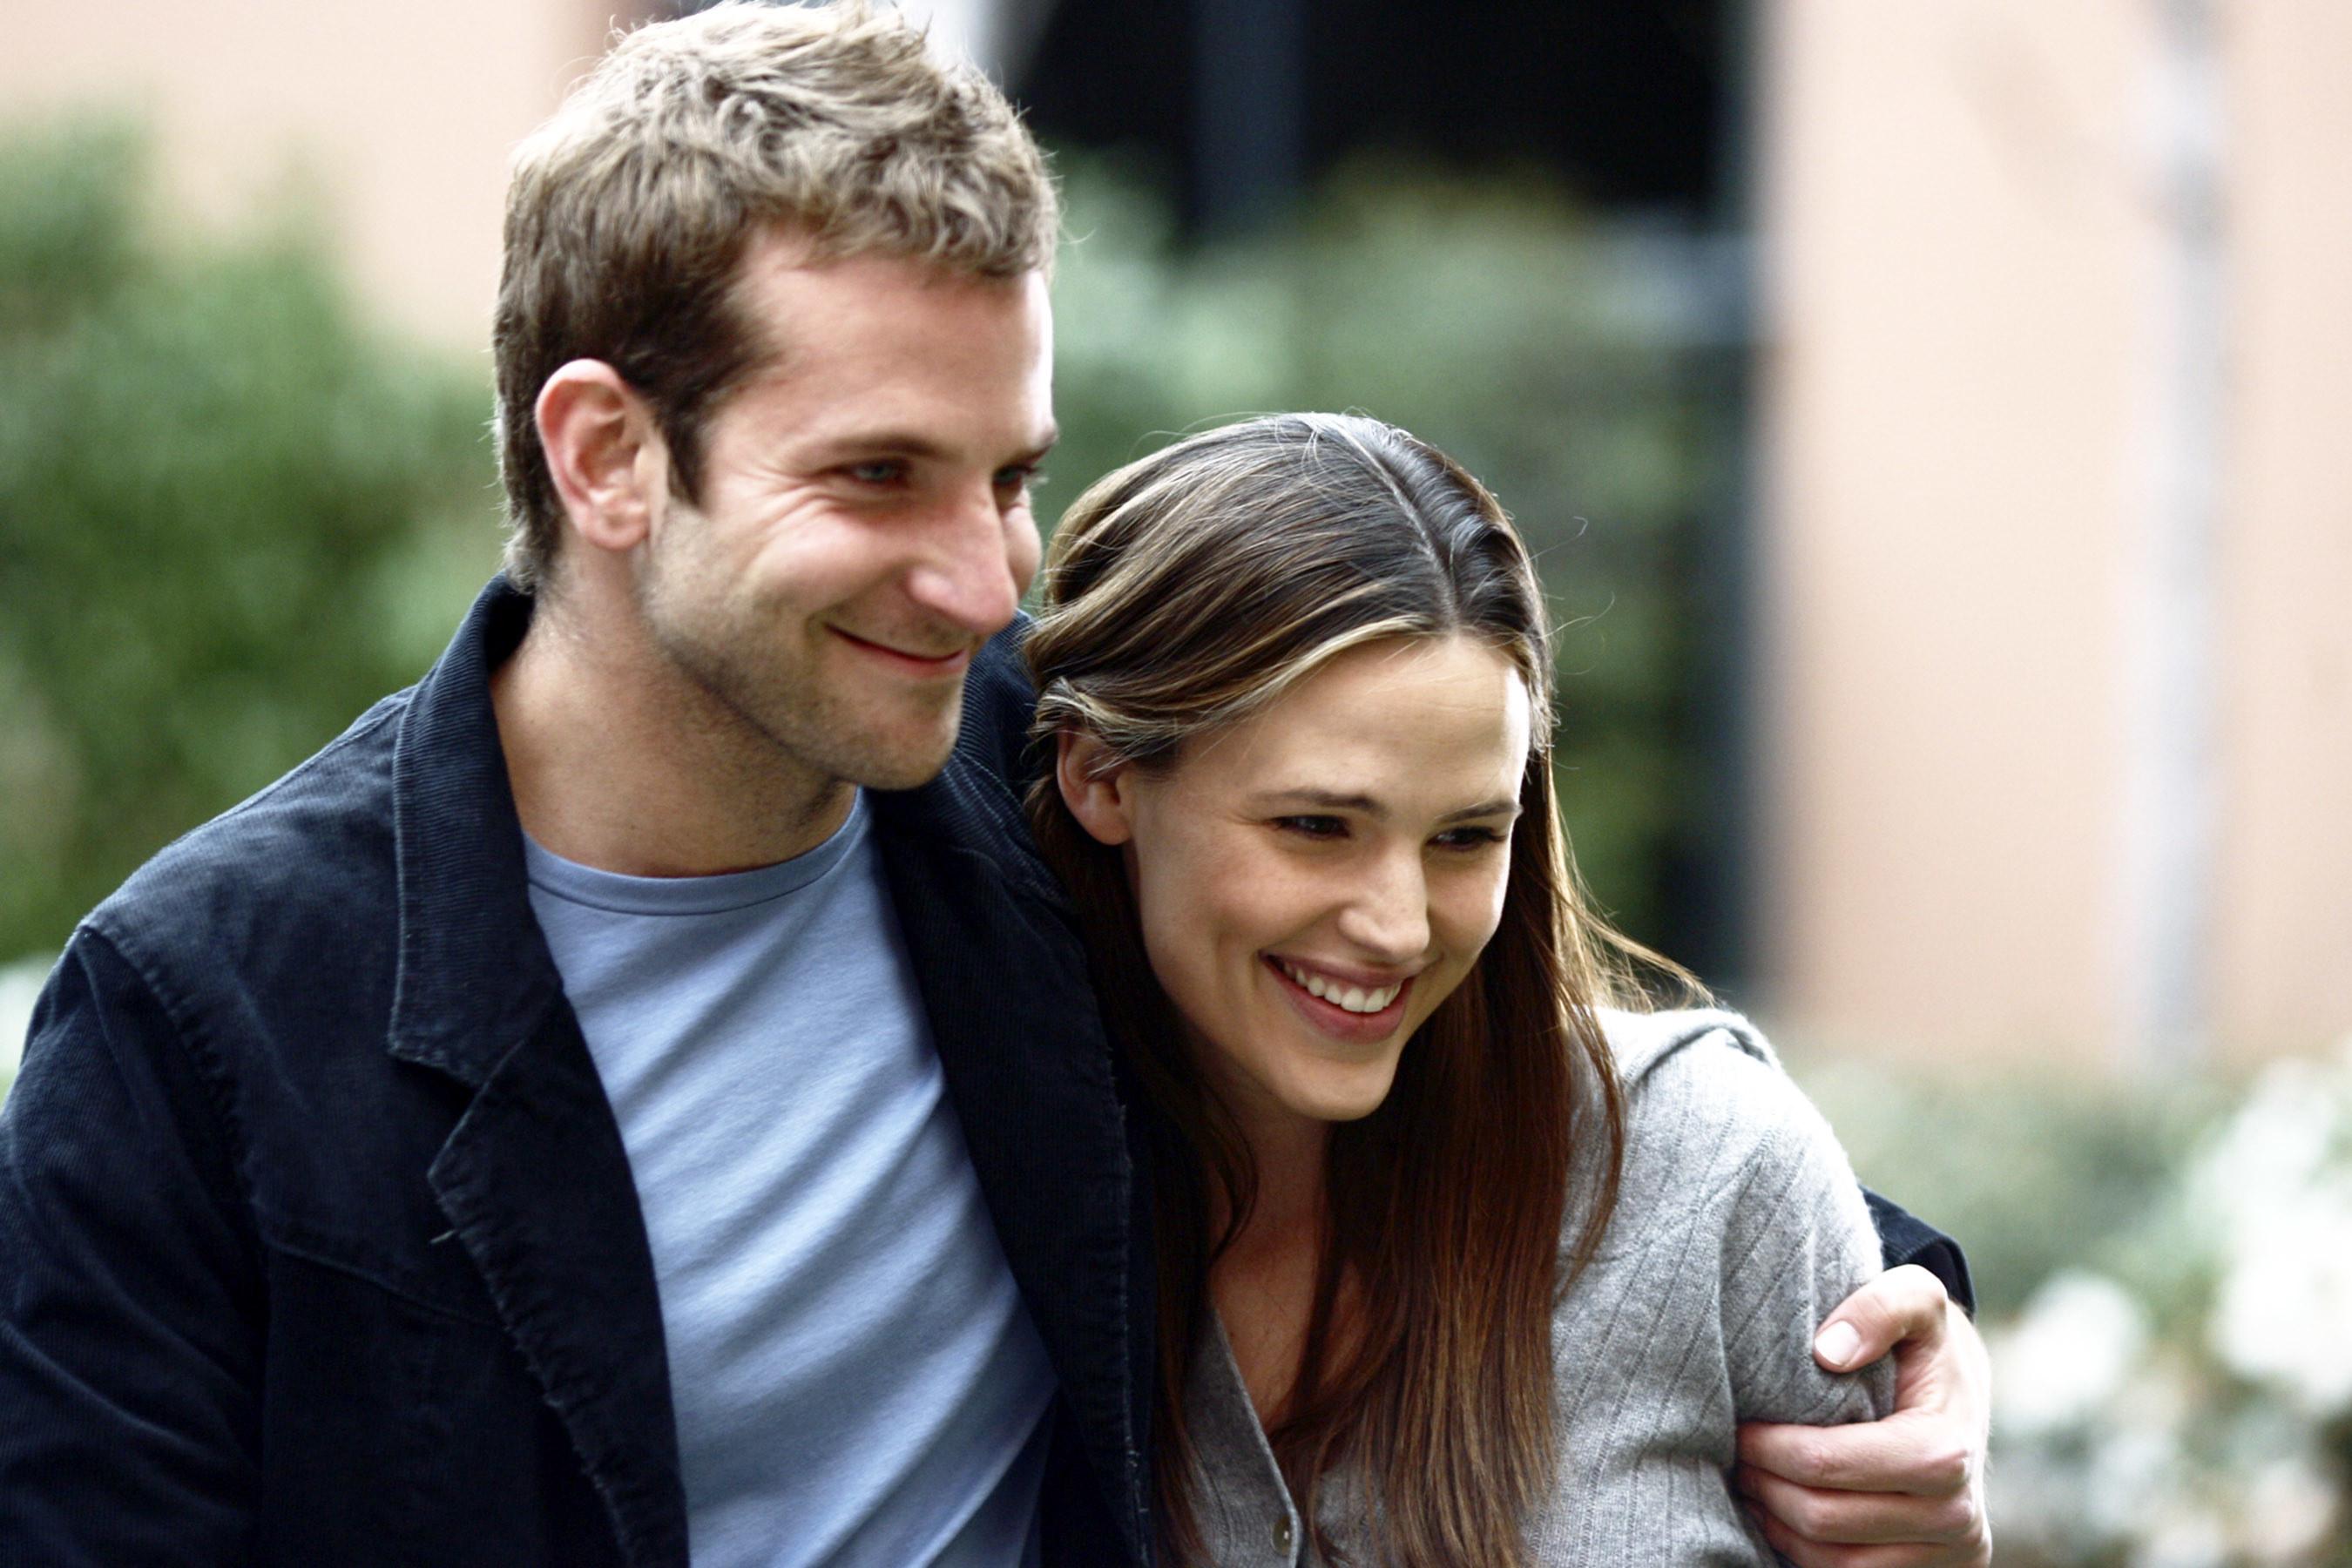 ALIAS, Bradley Cooper, Jennifer Garner, 'There's Only One Sydney Bristow' (Season 5, aired April 26, 2006)